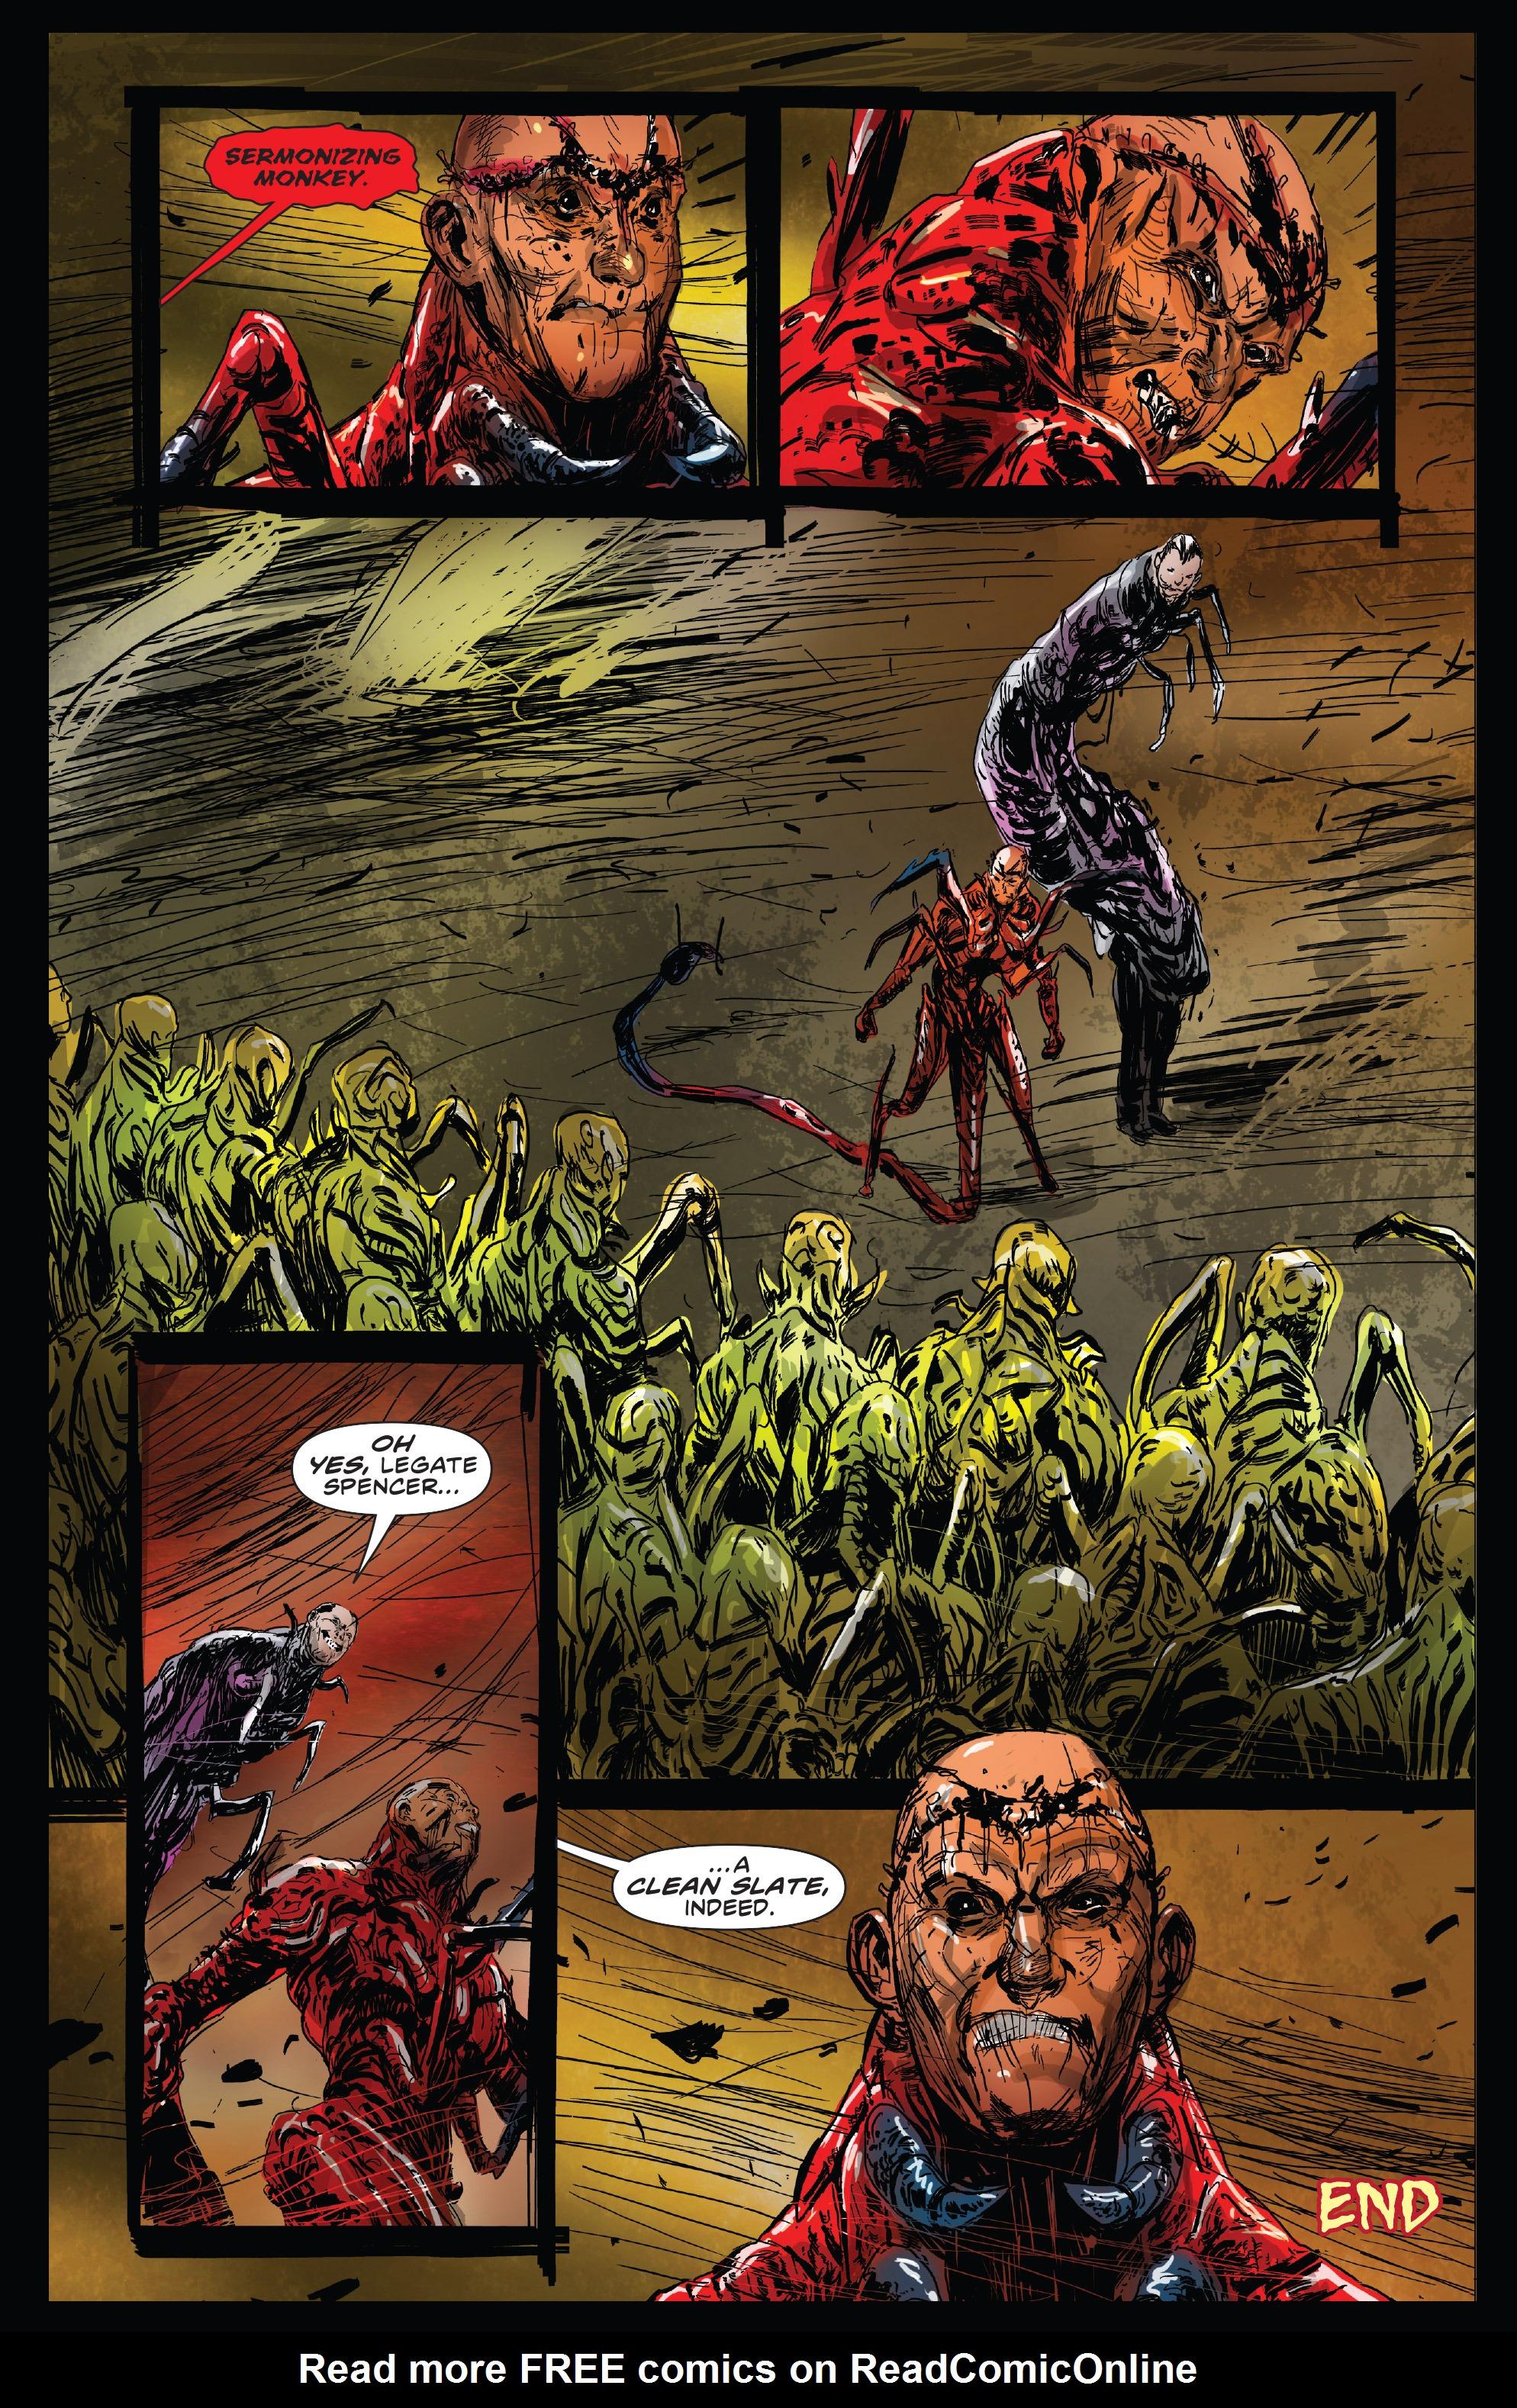 Read online Clive Barker's Hellraiser: The Dark Watch comic -  Issue # TPB 3 - 14